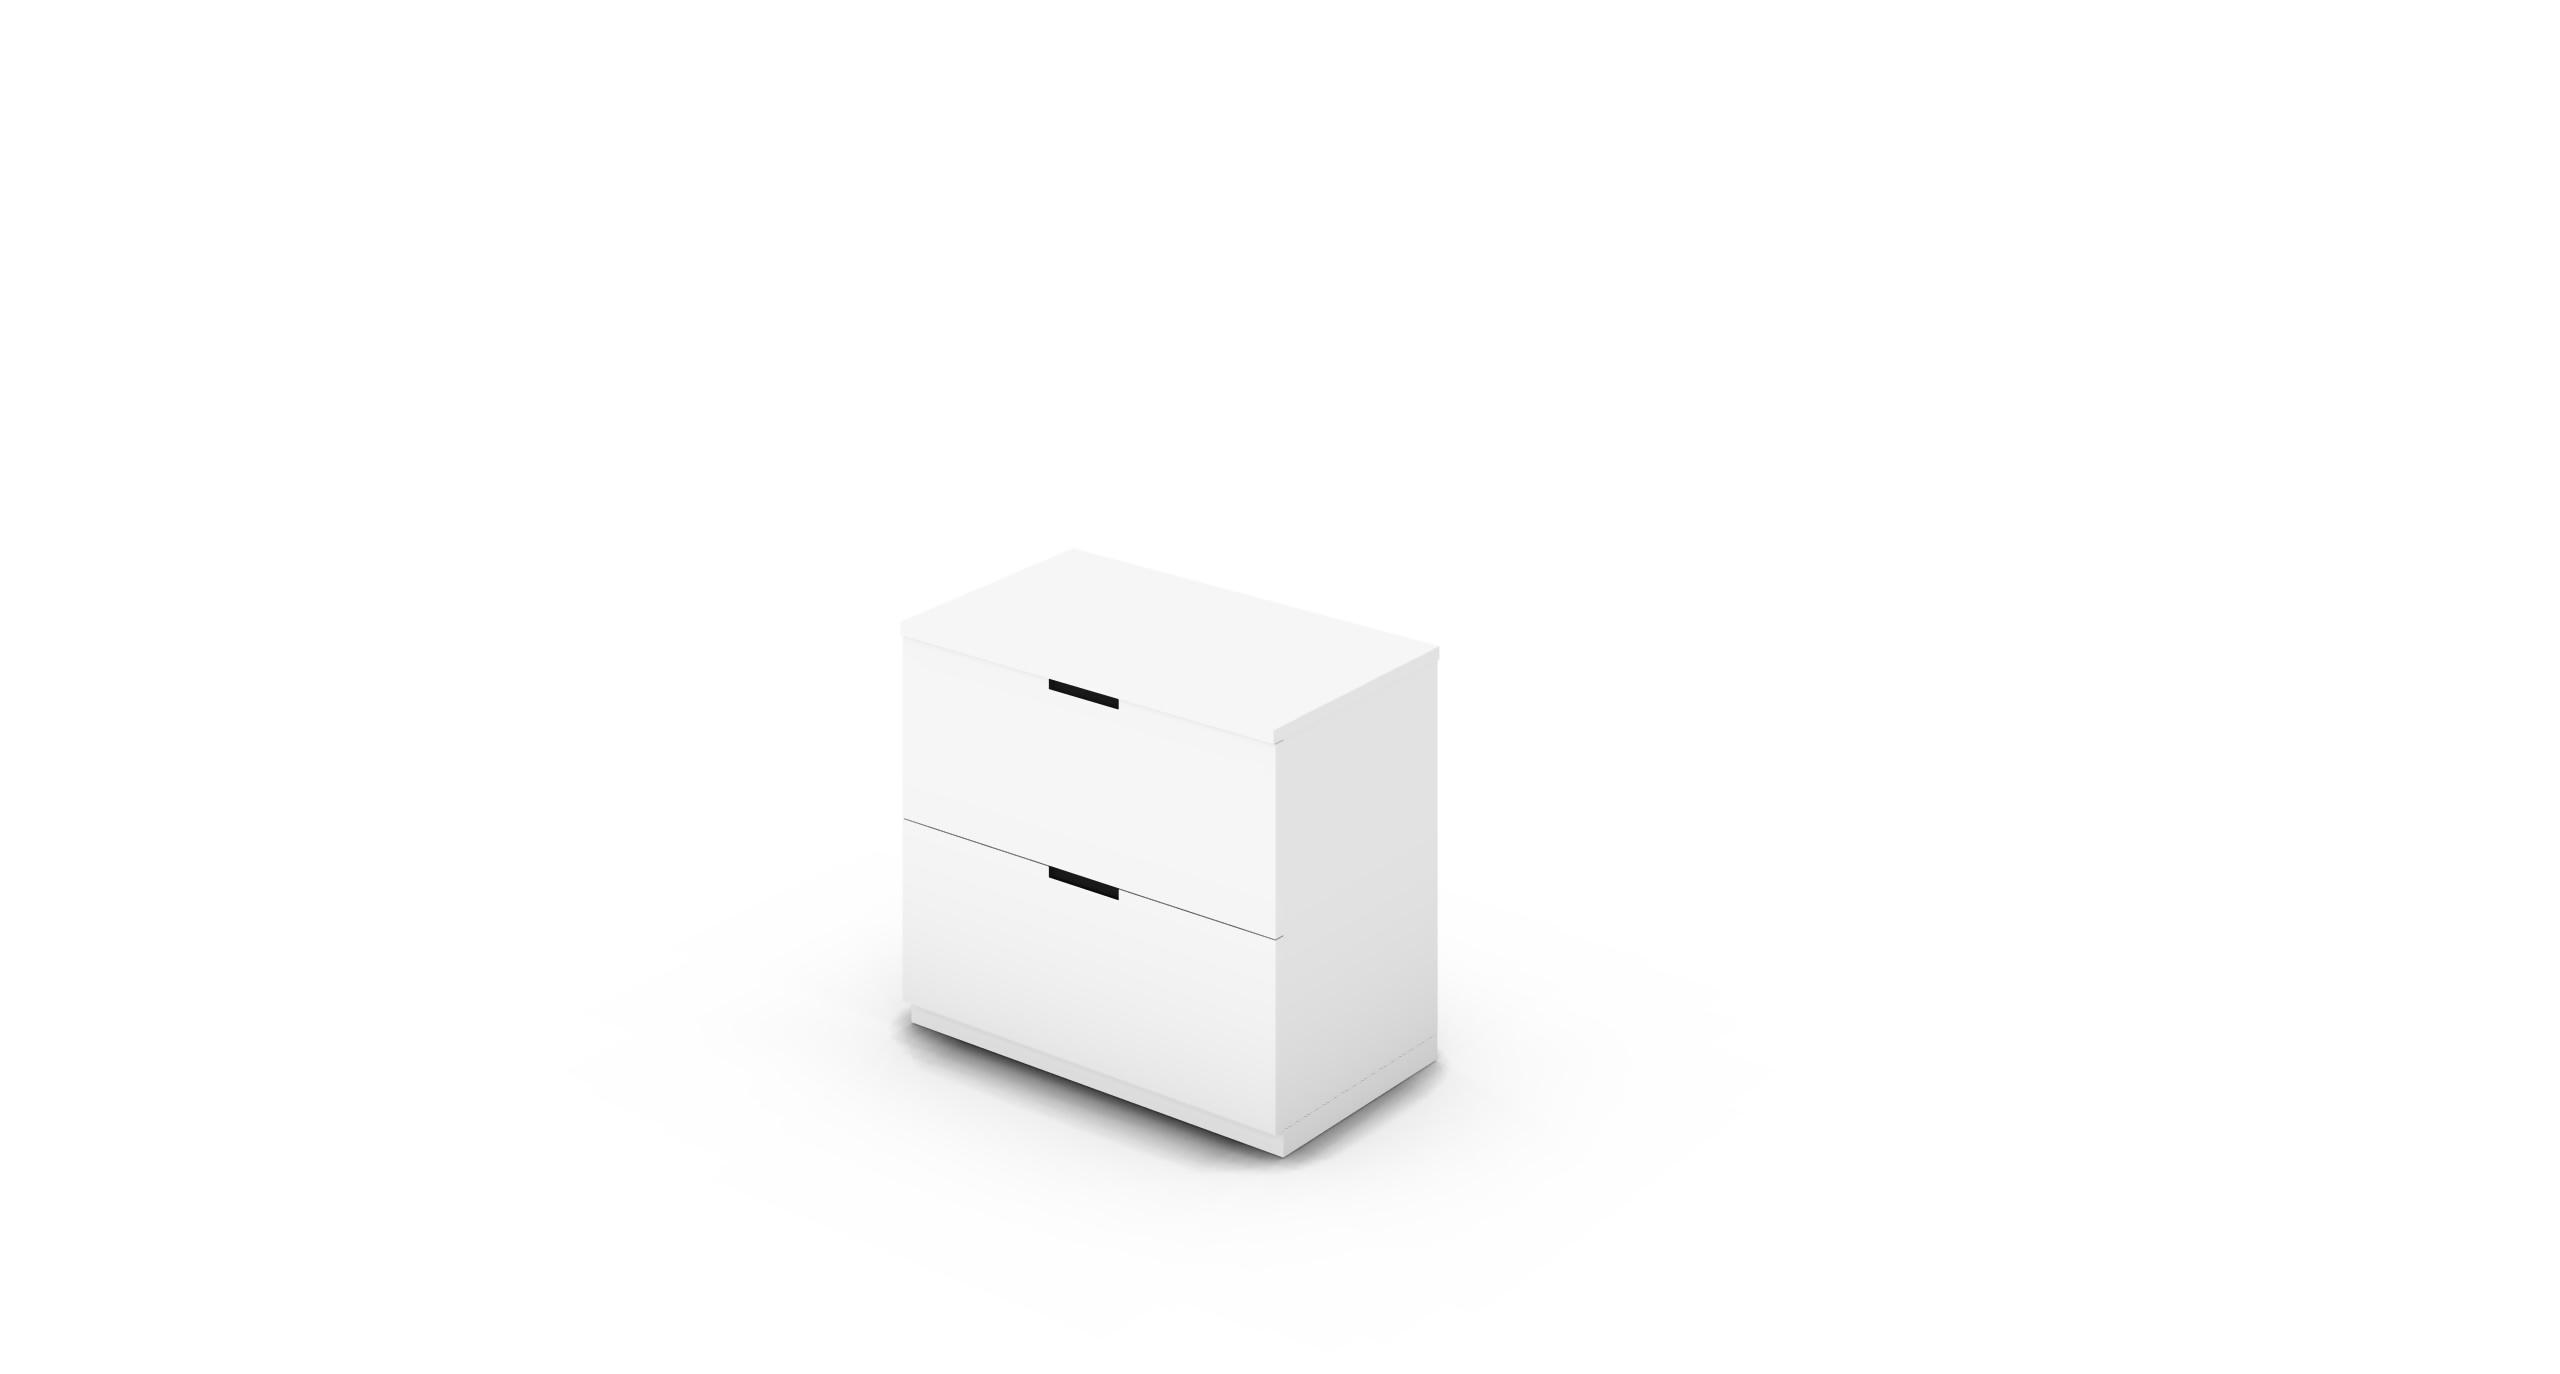 Cabinet_800x450x775_DR_White_CutOut_NoCylinder